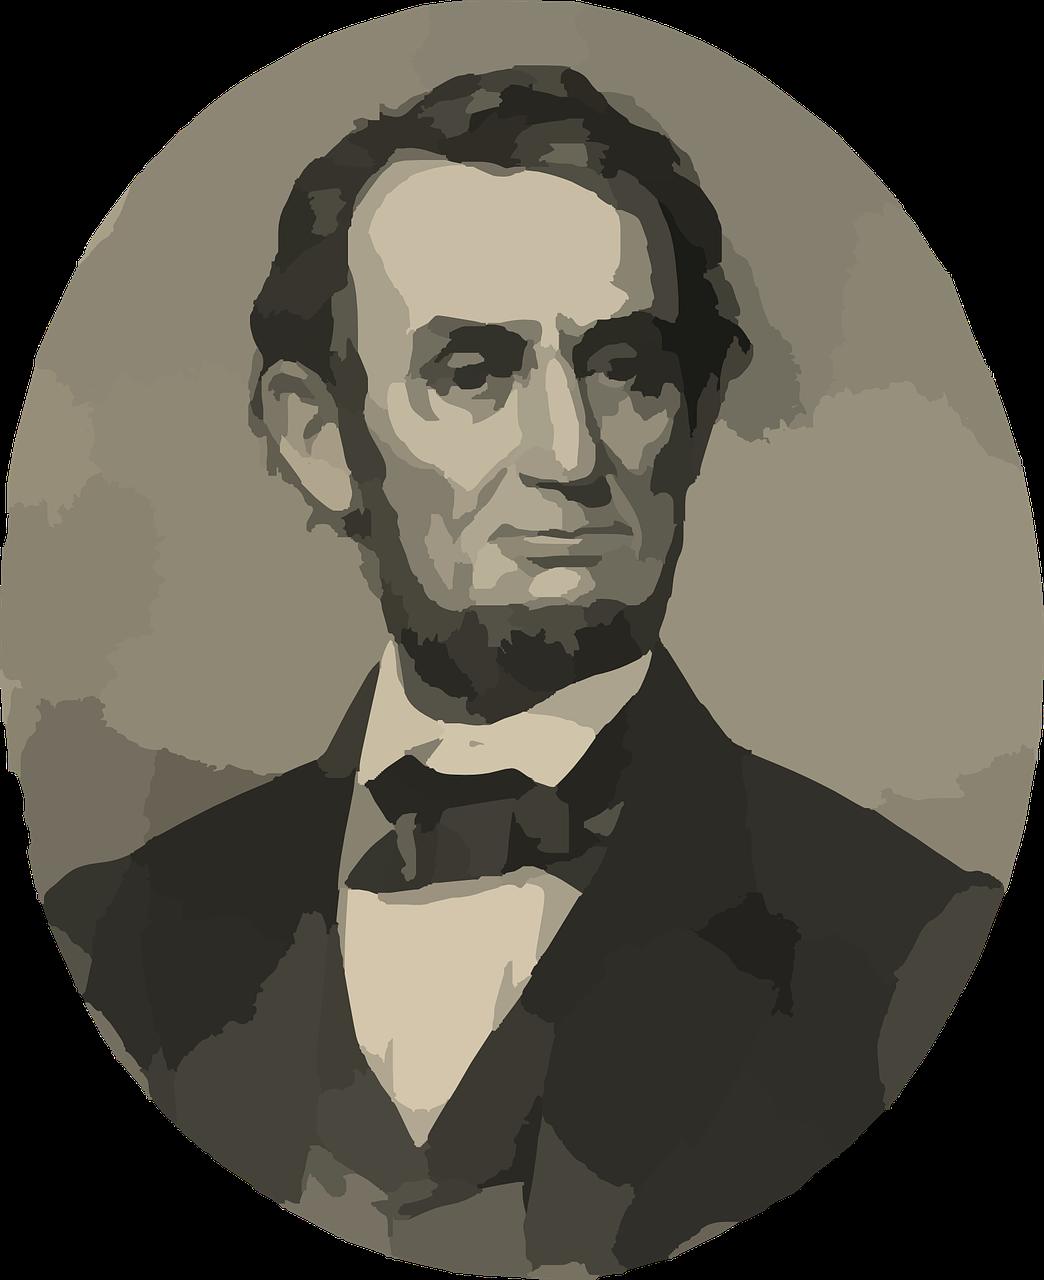 Abraham Lincoln inspiration motivation